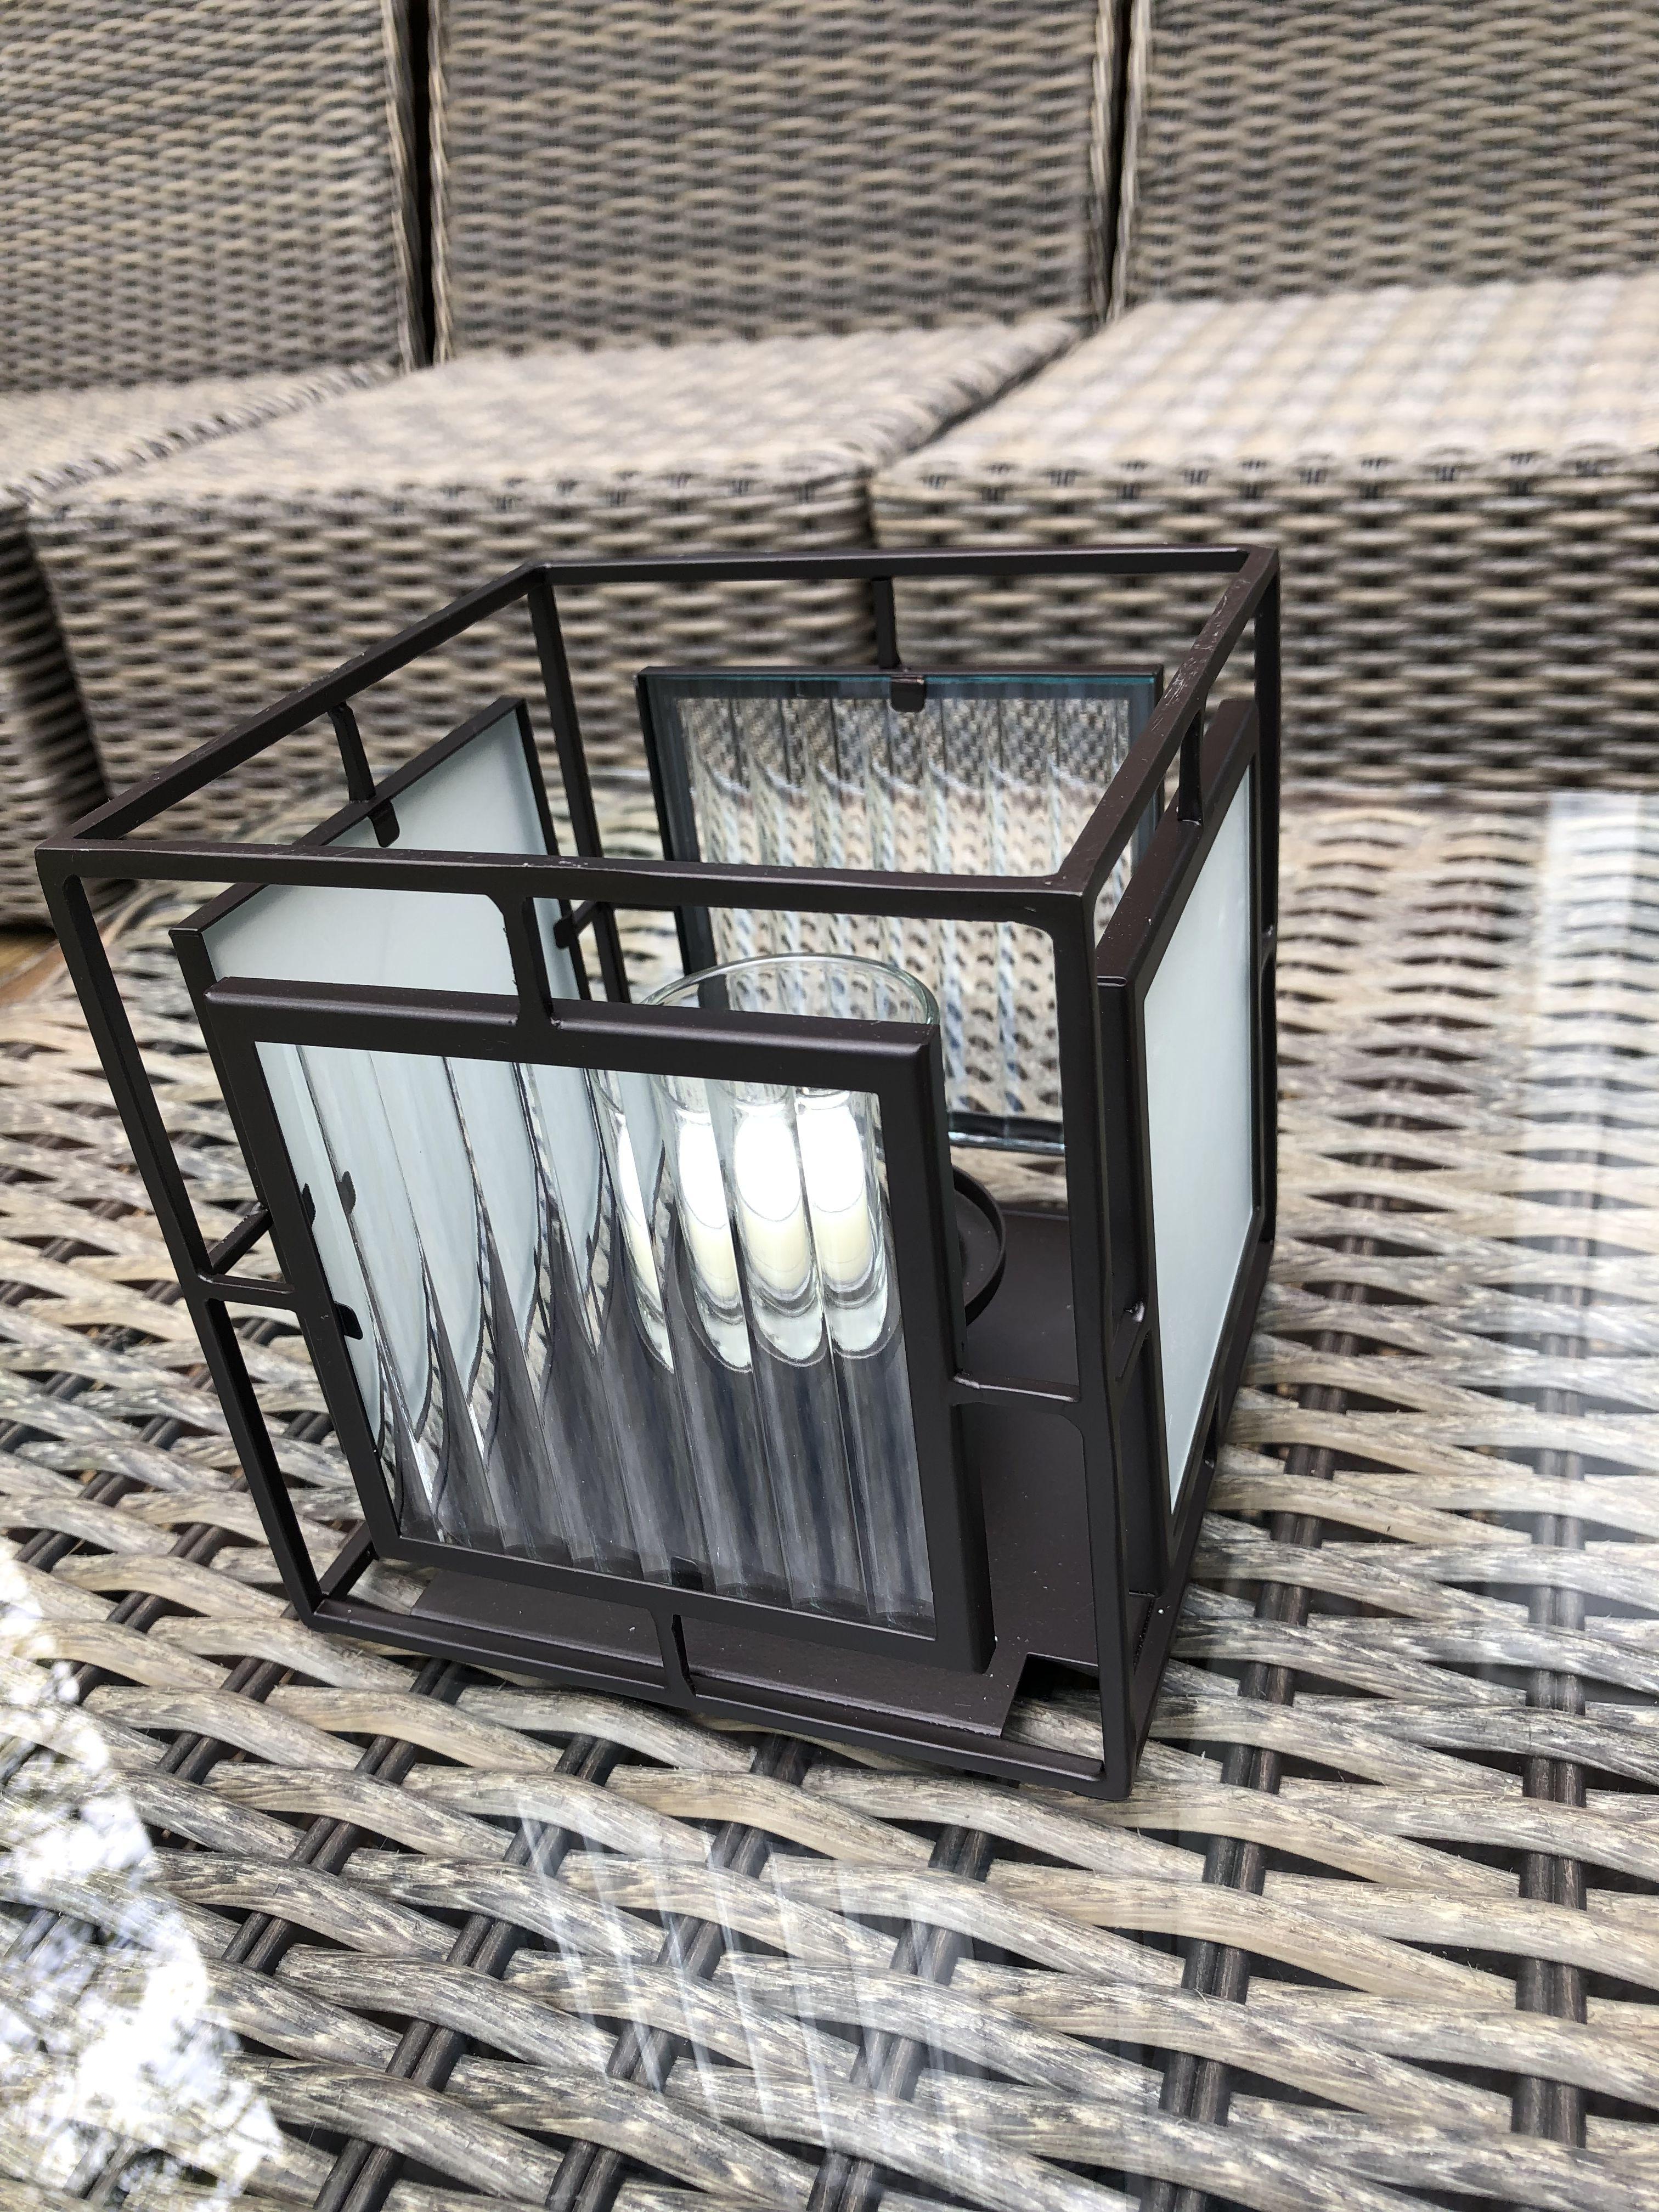 Modern Impressions Votive Holder Votive Holder Glass Votive Holders Tea Lights